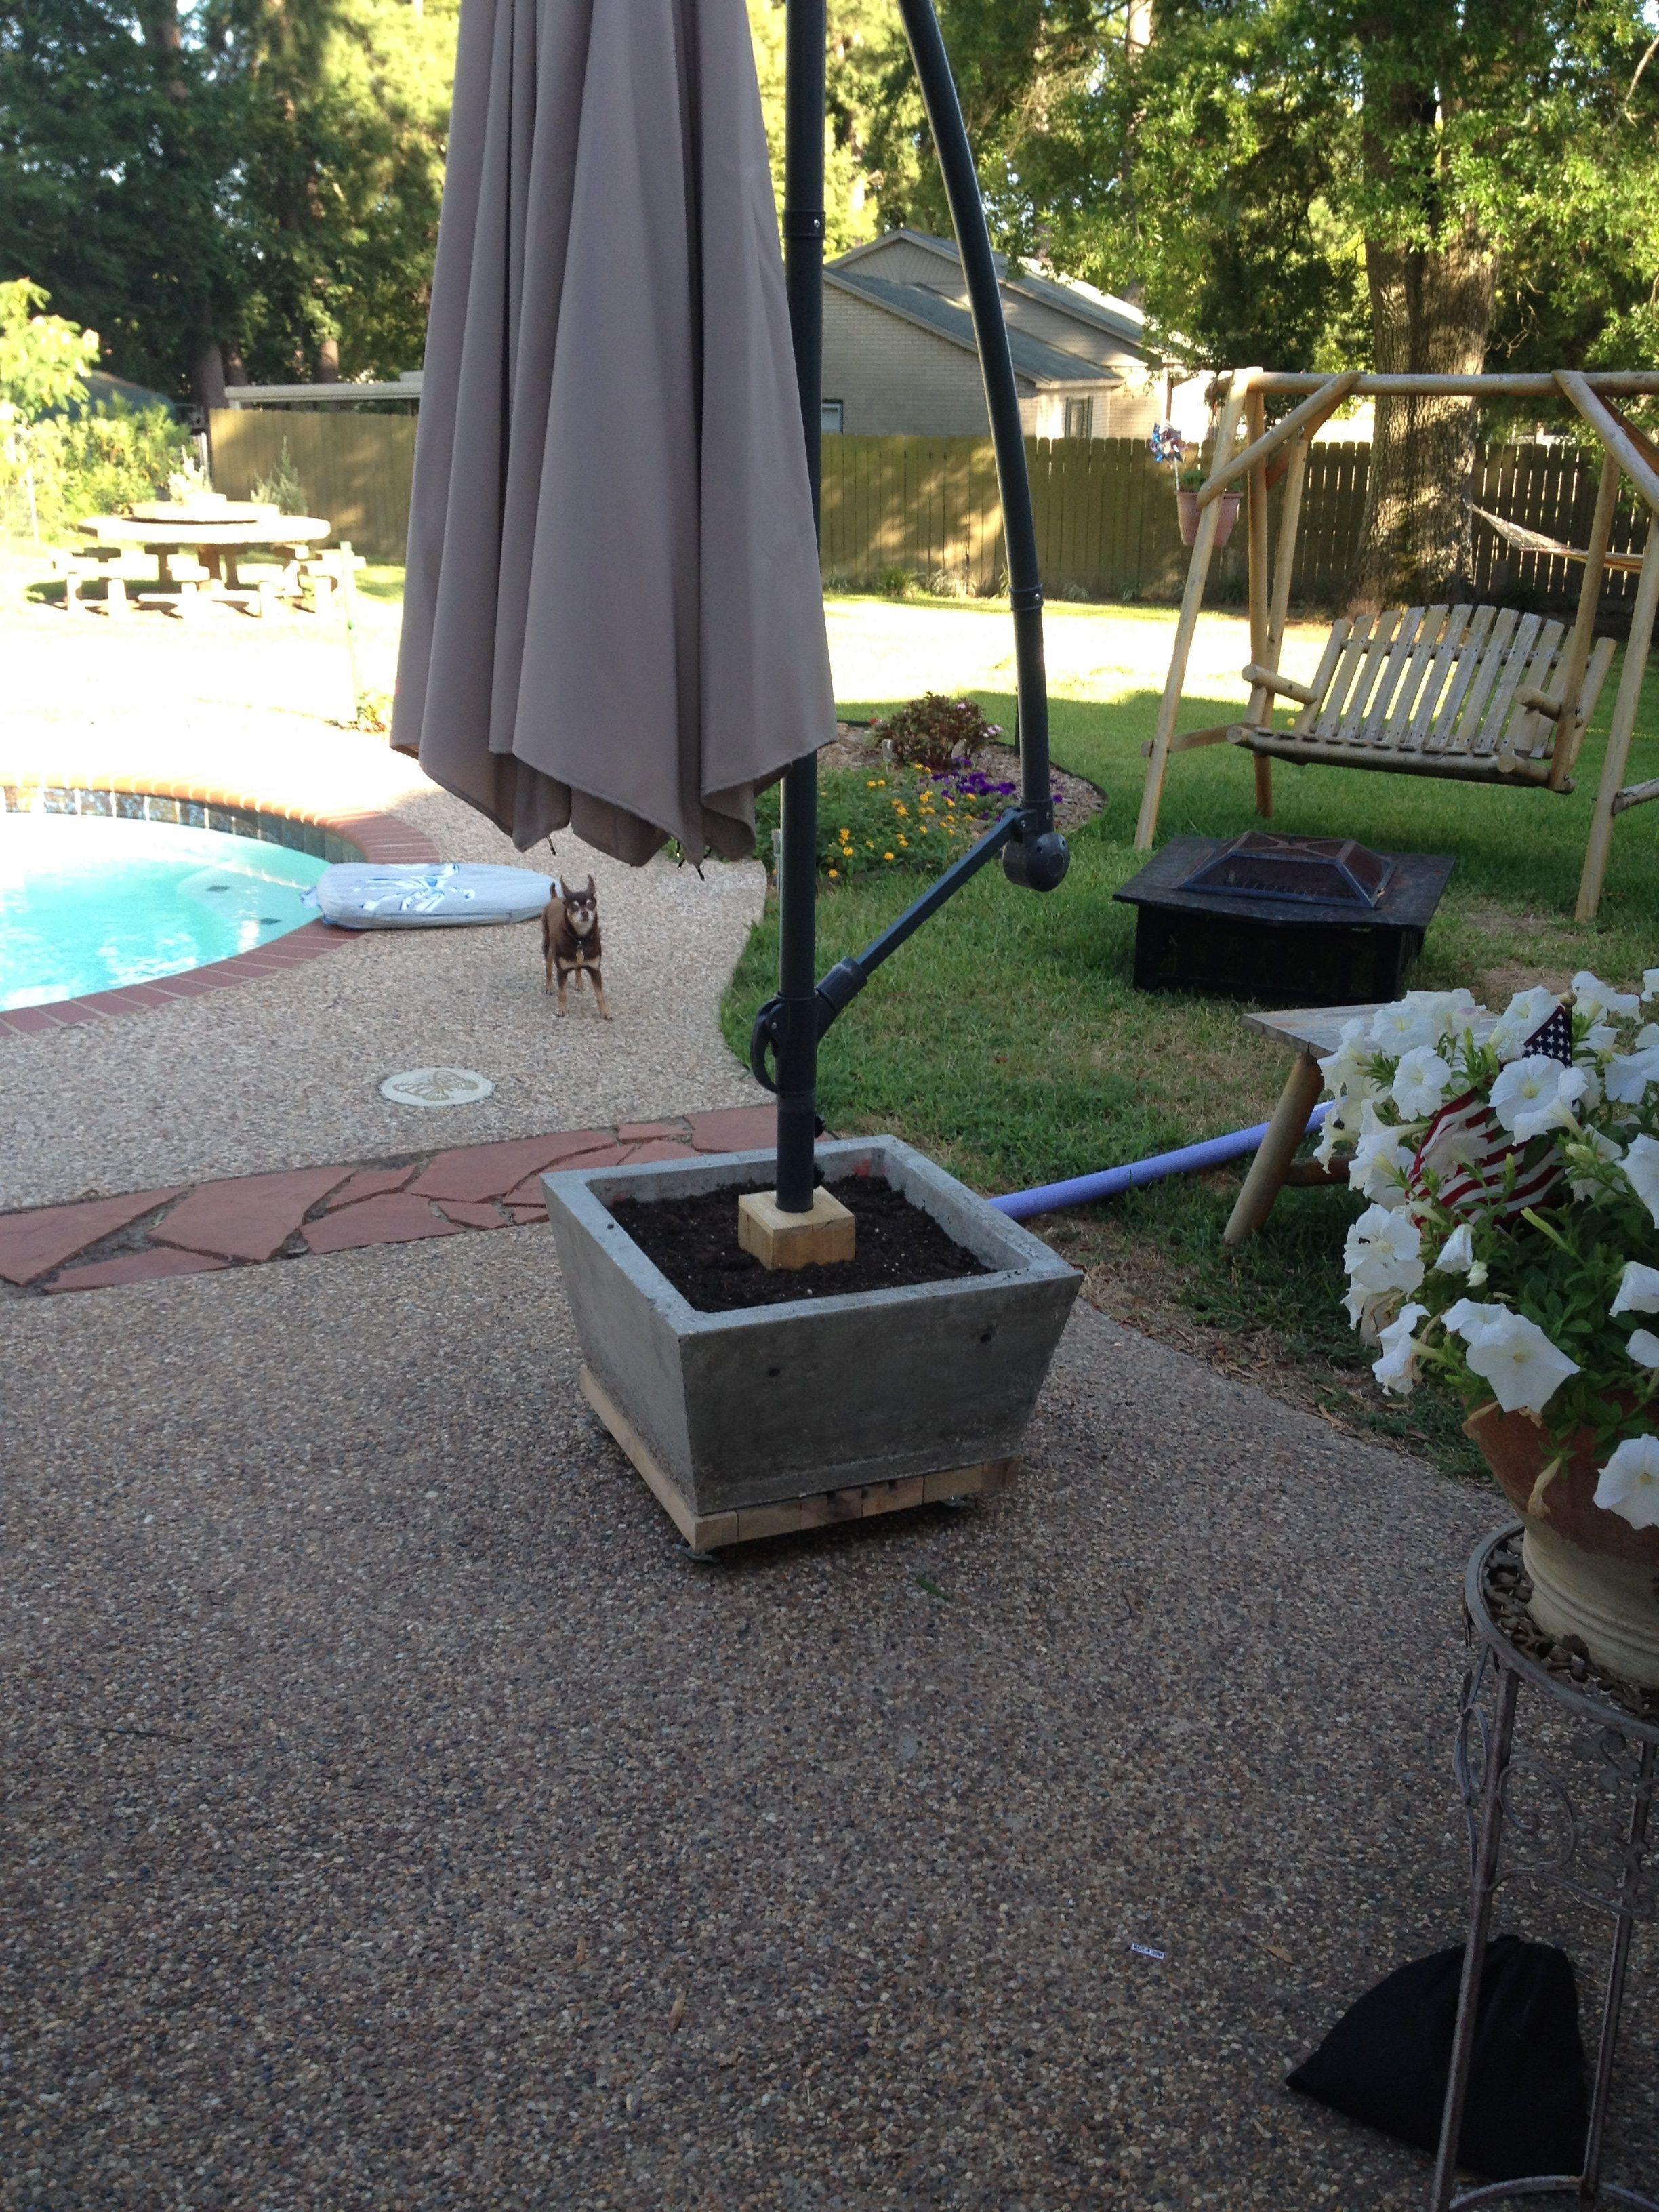 Concrete Planter Base For Offset Patio Umbrella Offset Patio Umbrella Patio Umbrella Stand Outdoor Umbrella Stand